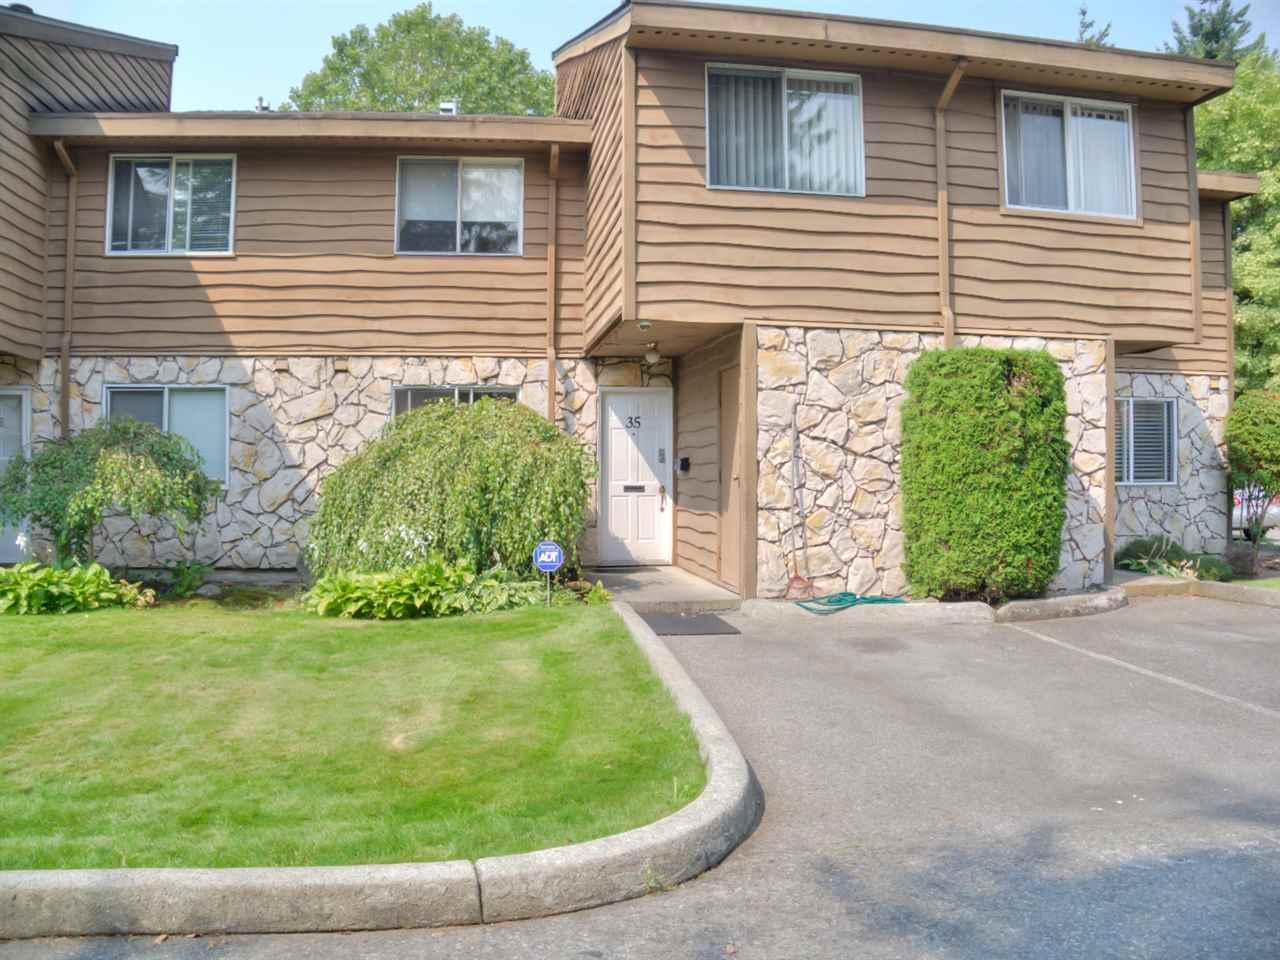 Townhouse at 35 9111 NO. 5 ROAD, Unit 35, Richmond, British Columbia. Image 1